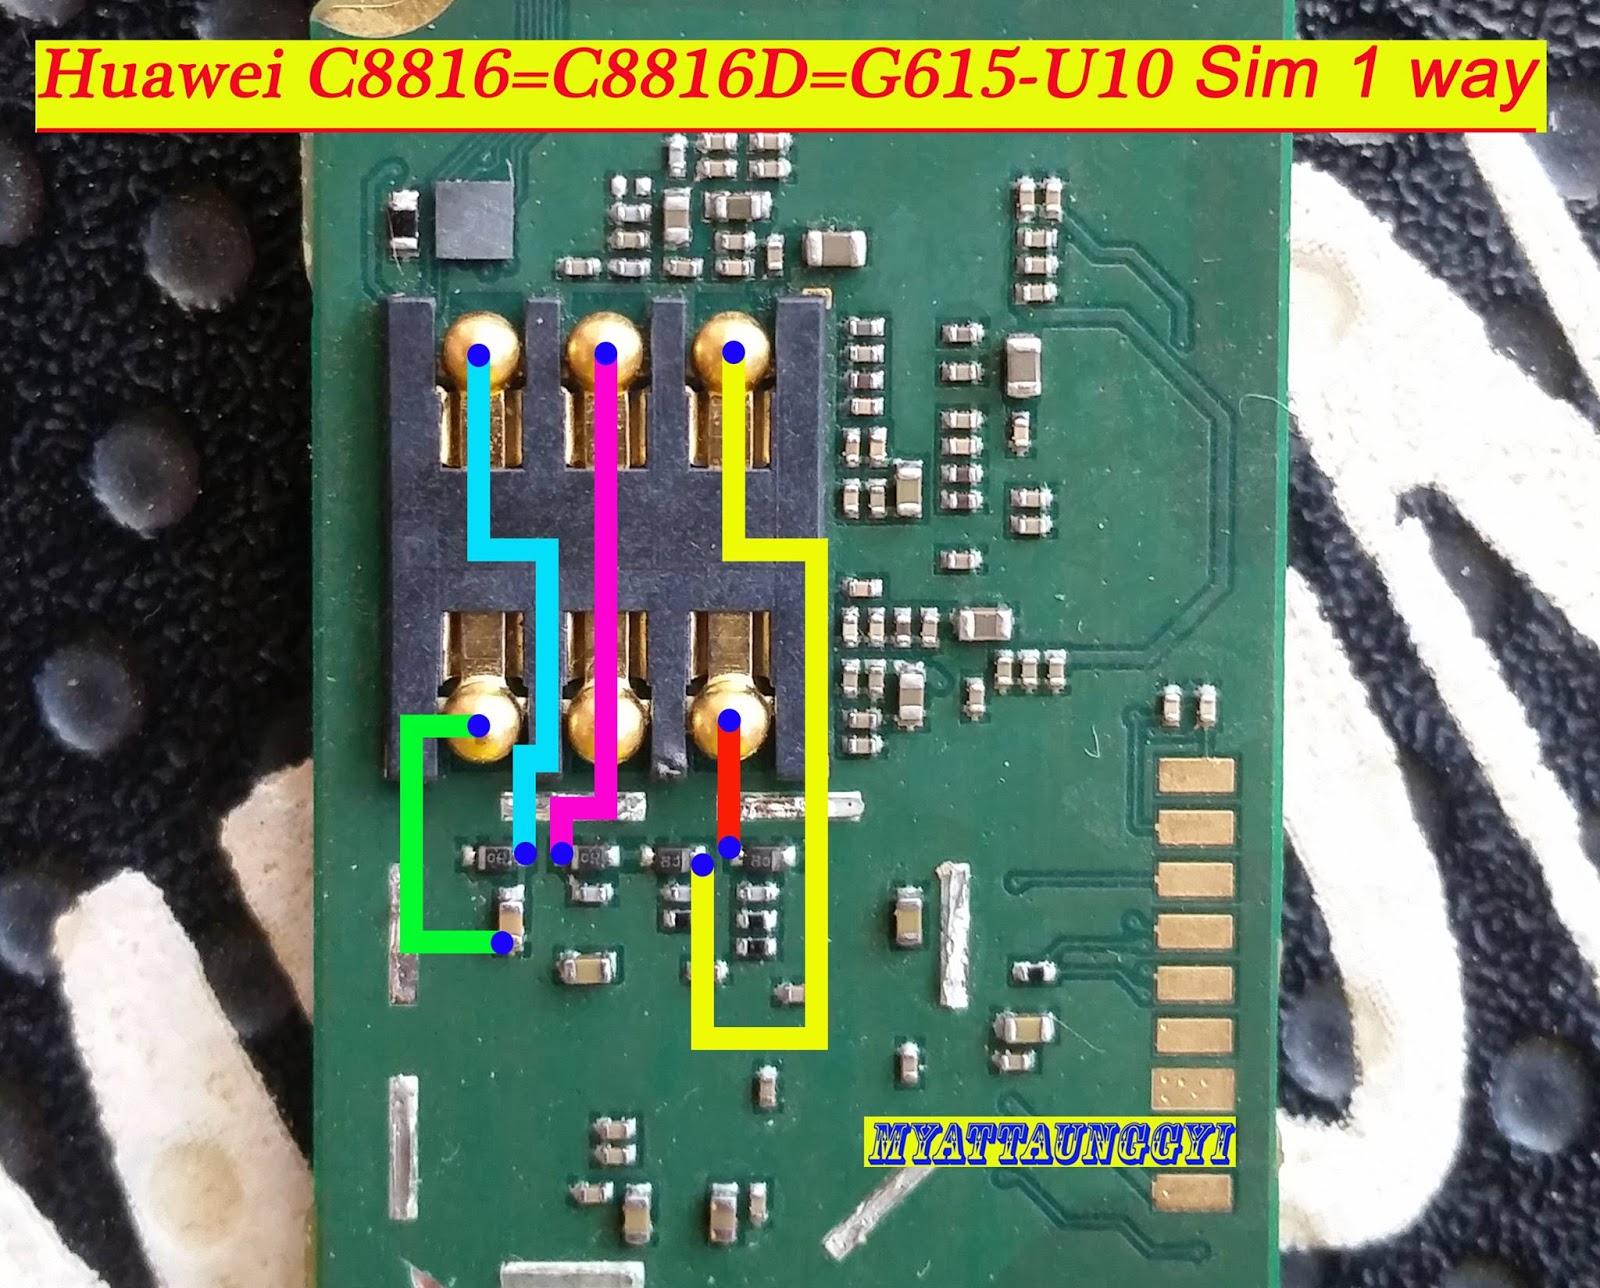 Huawei C8816 , C8816D , G615U10 Jumper Way